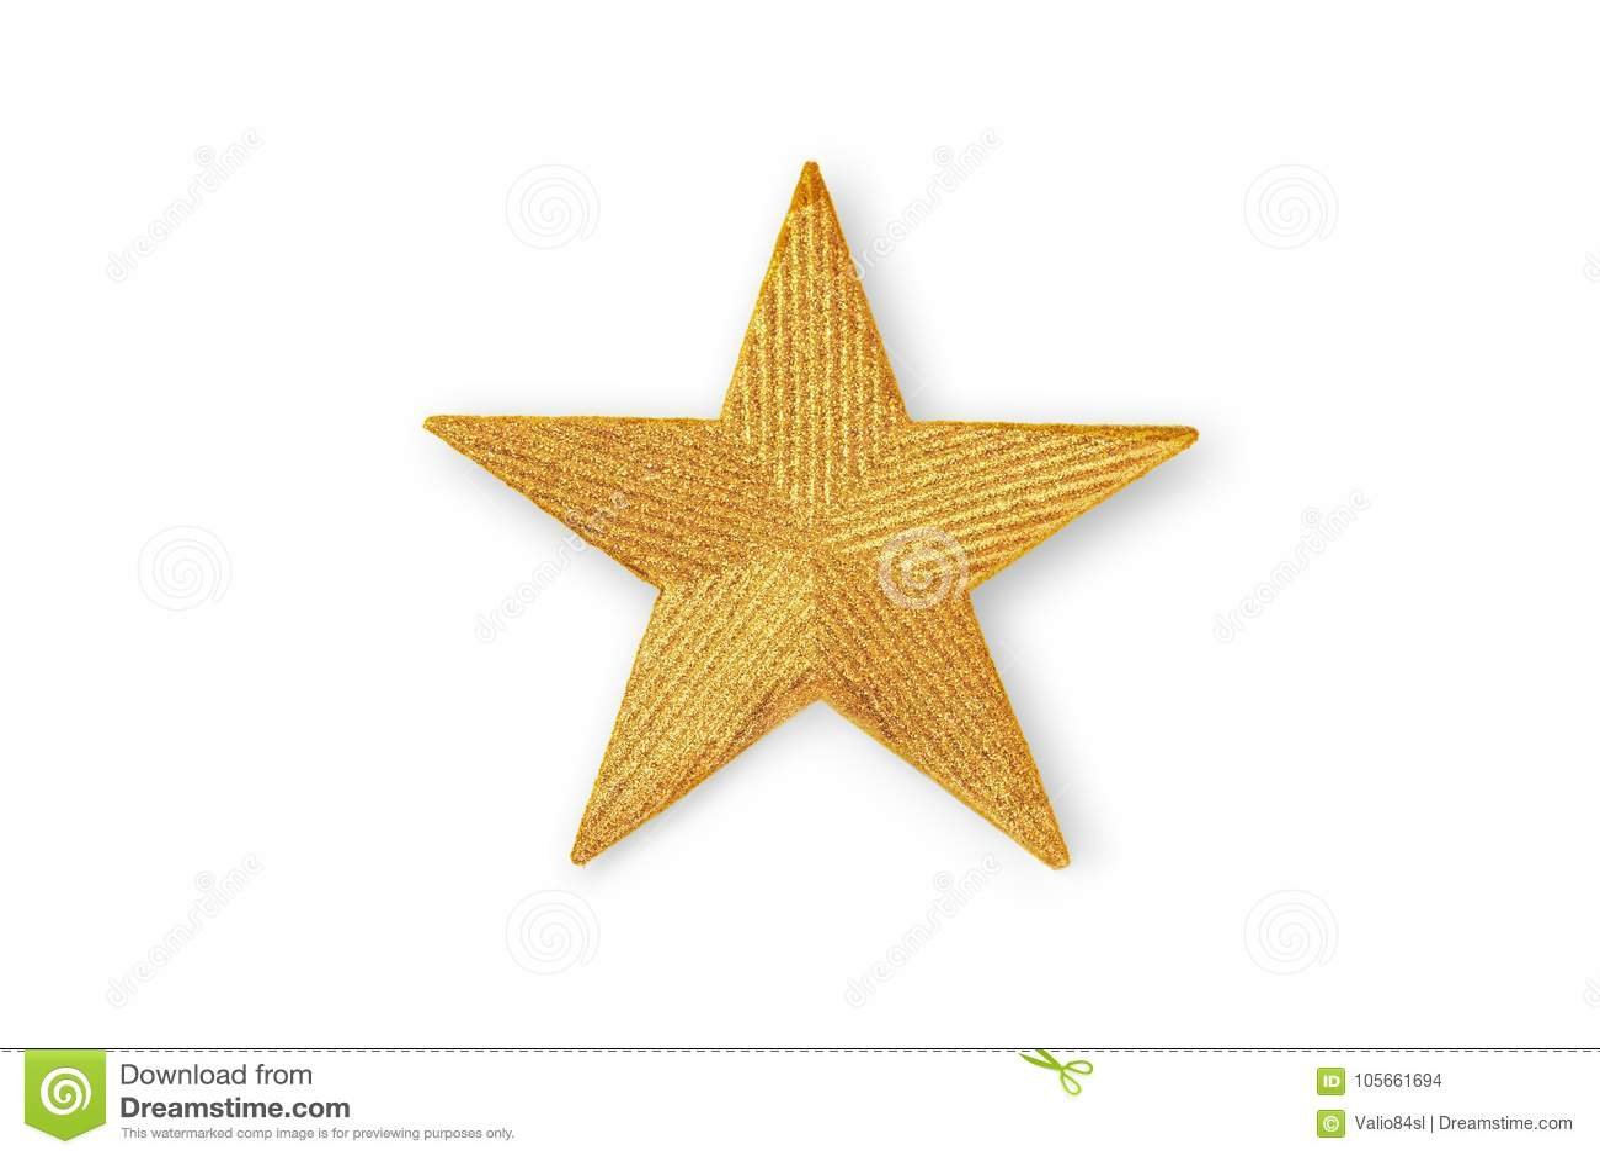 Golden Christmas star, Christmas ornament isolated on white